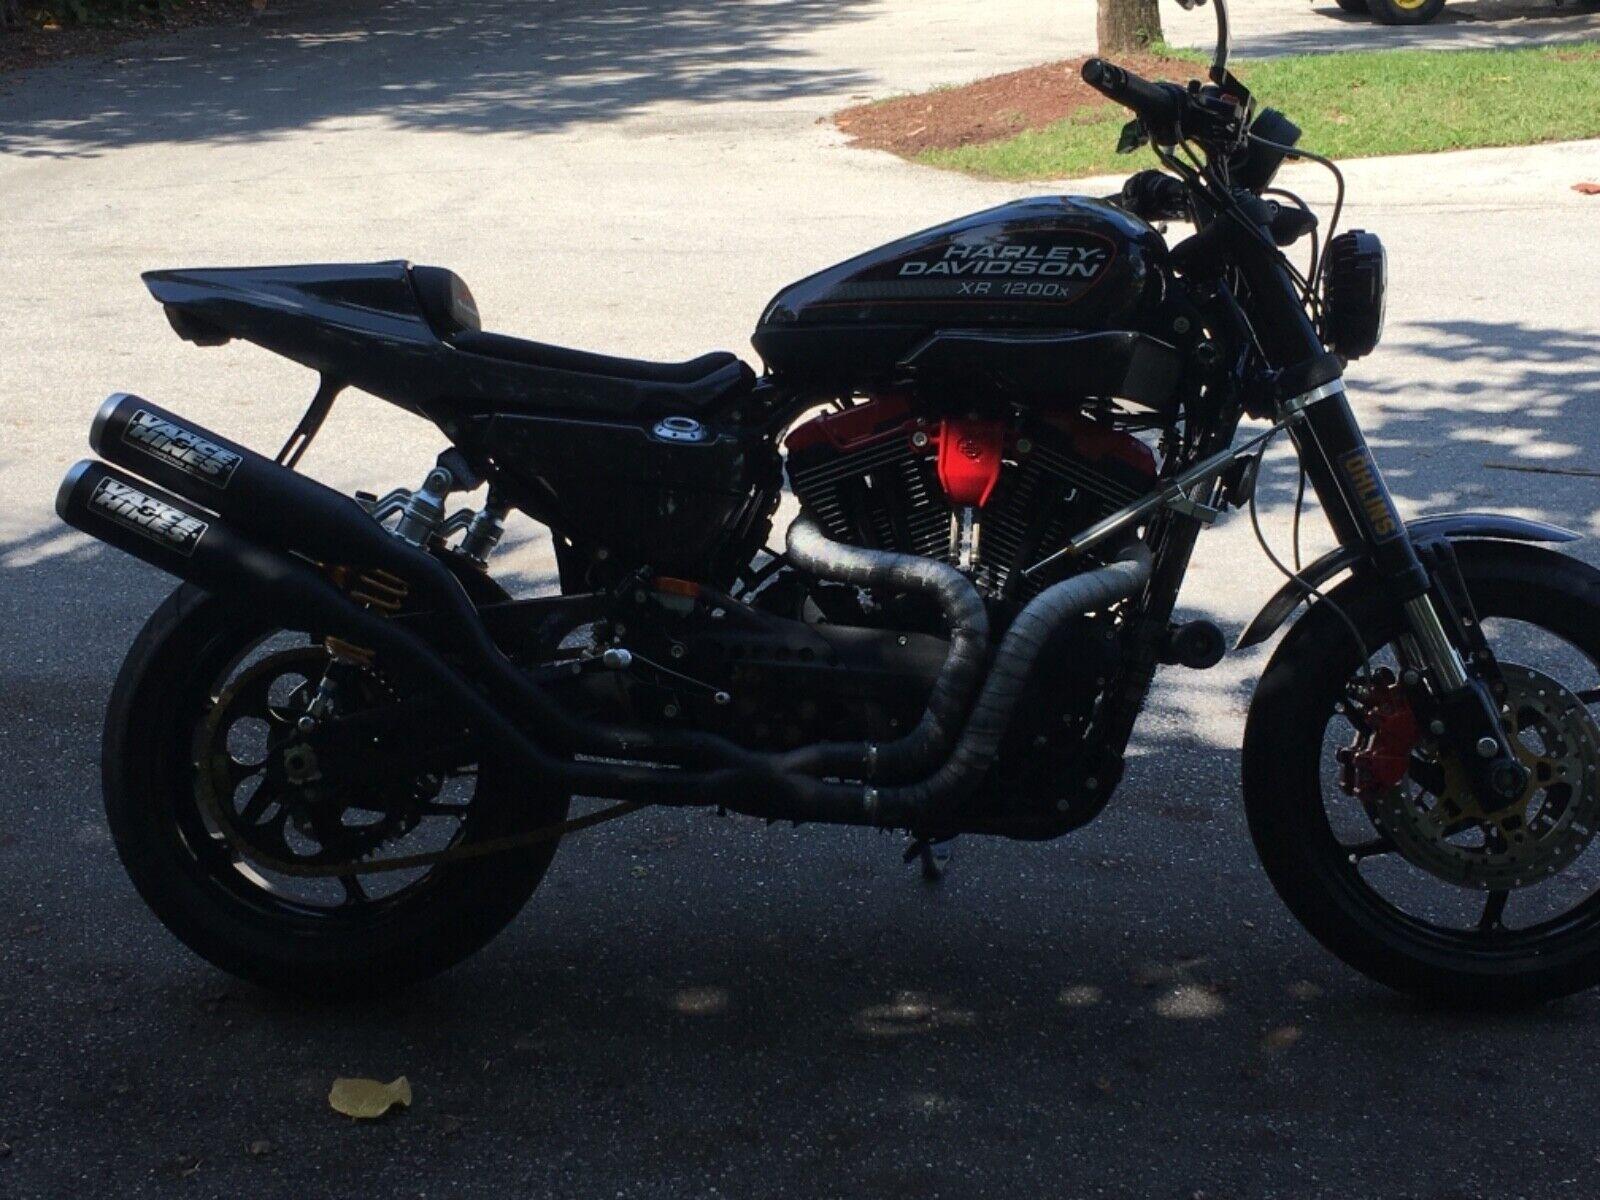 Harley xr1200x full custom NO RESERVE street fighter cafe racer supermoto